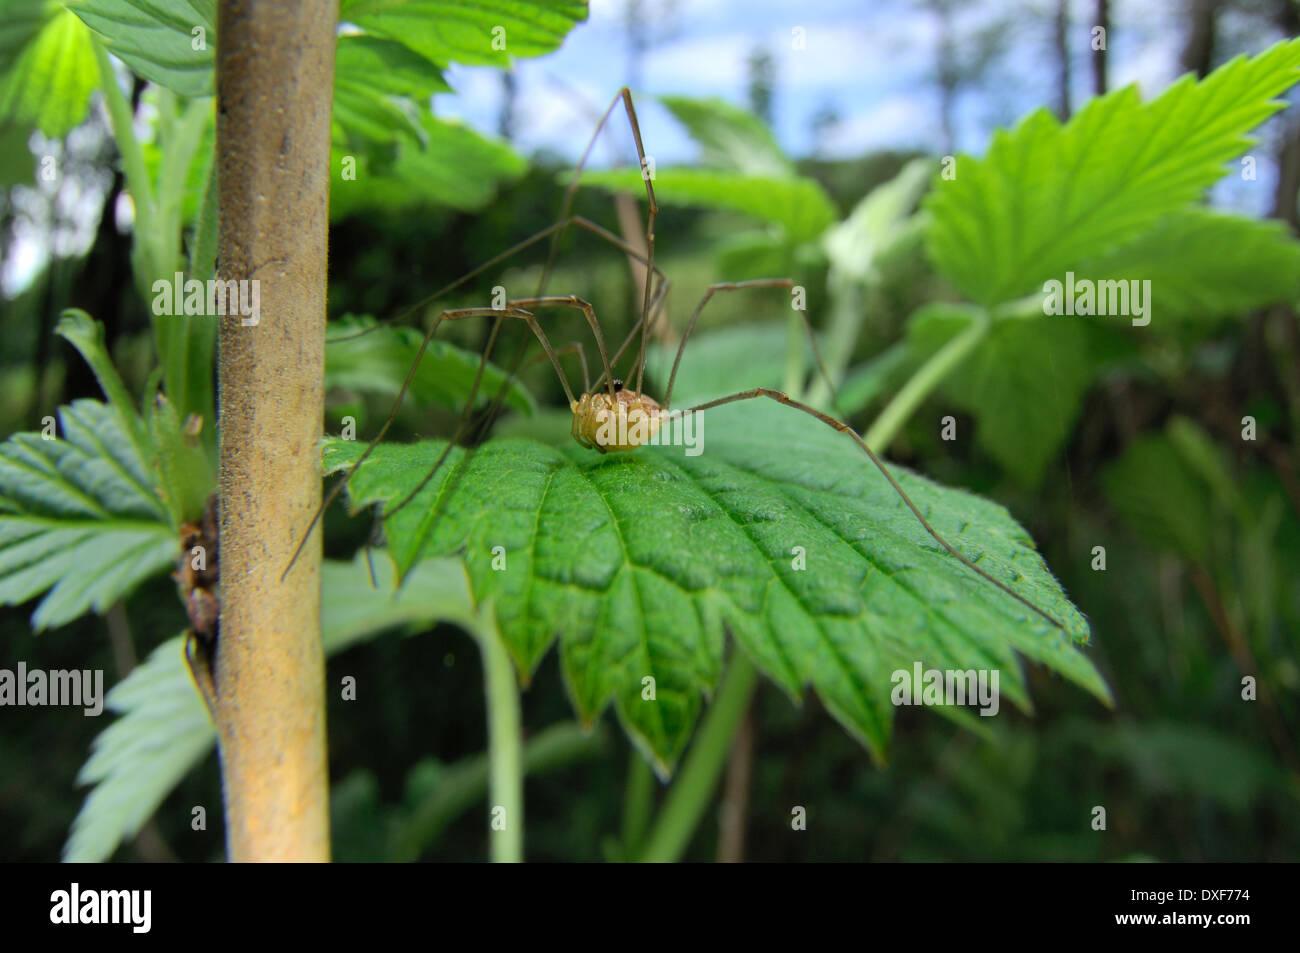 Harvestman immature (Phalangium opilio) | Weberknecht (Phalangium opilio) - Stock Image